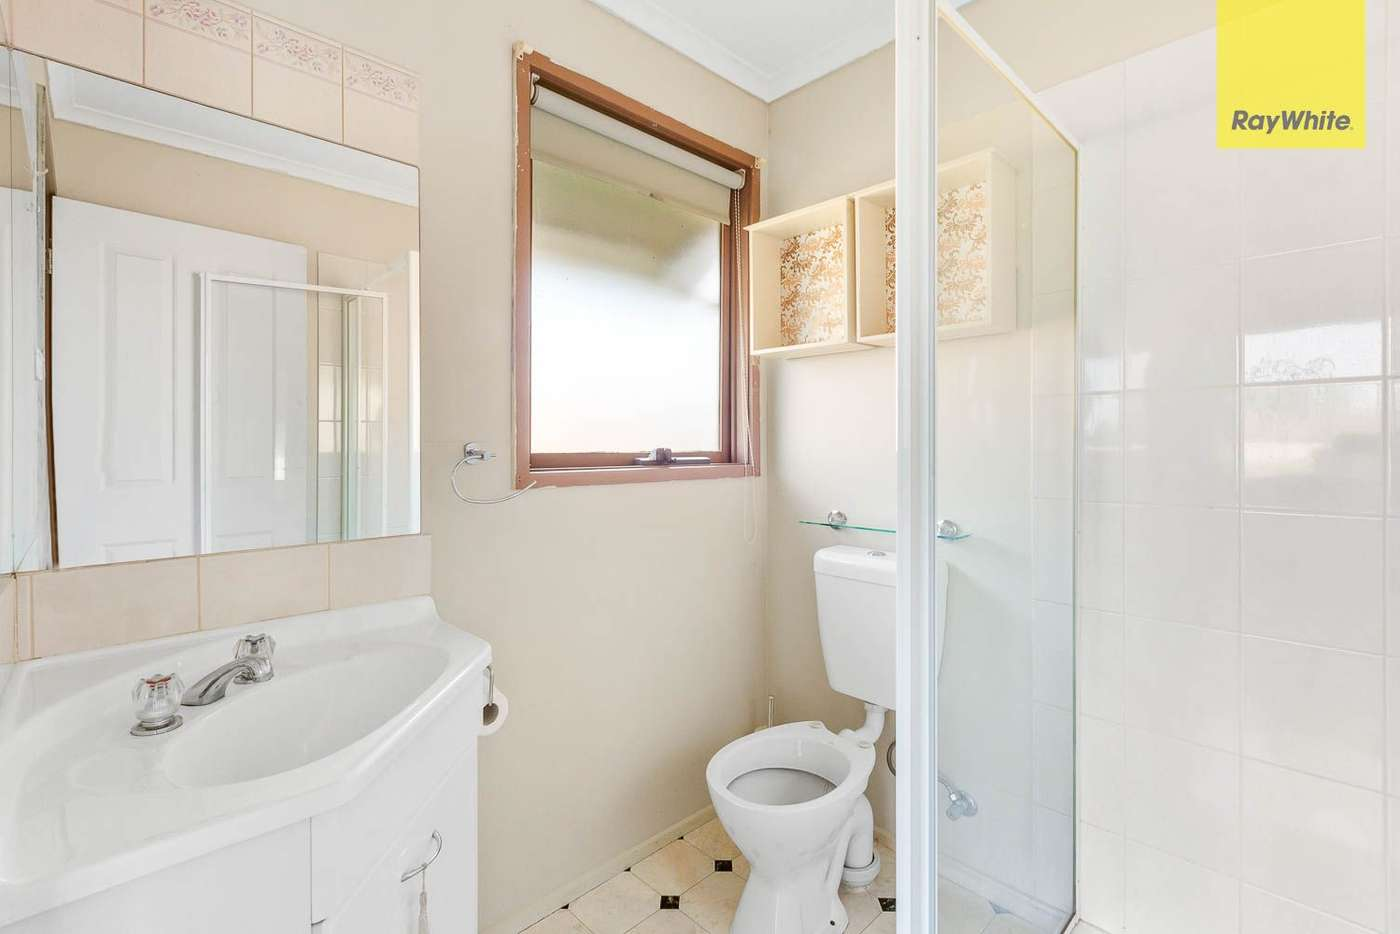 Sixth view of Homely house listing, 27 Jopling Street, Ballan VIC 3342